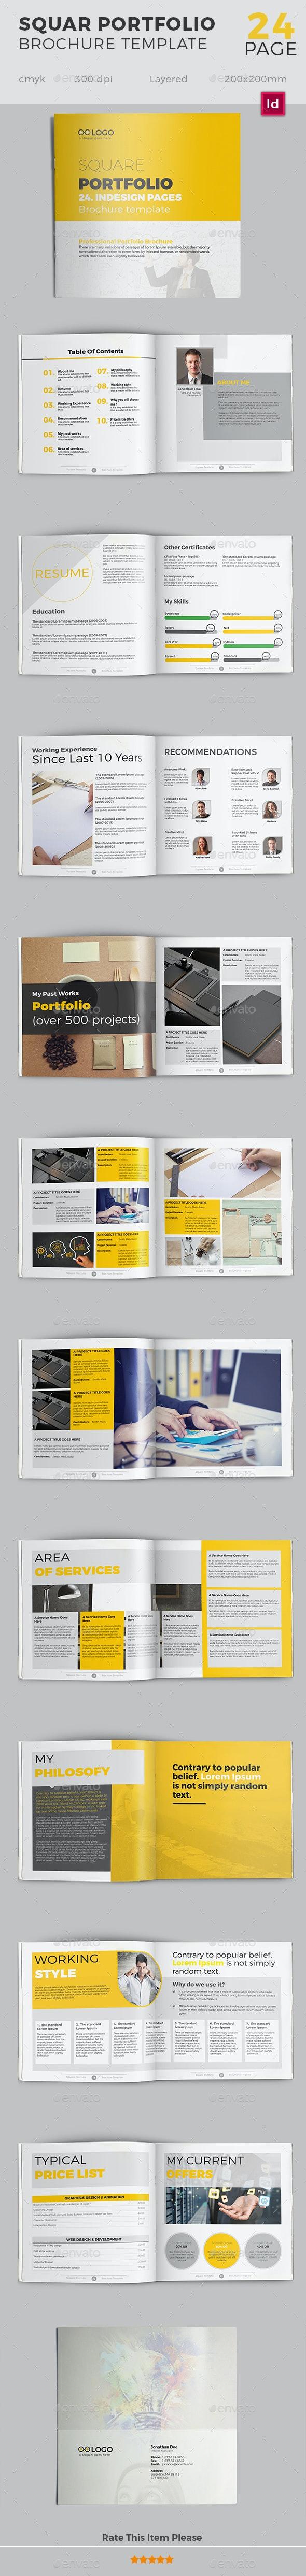 Square Portfolio Brochure Template V01 - 24 pages - Corporate Brochures